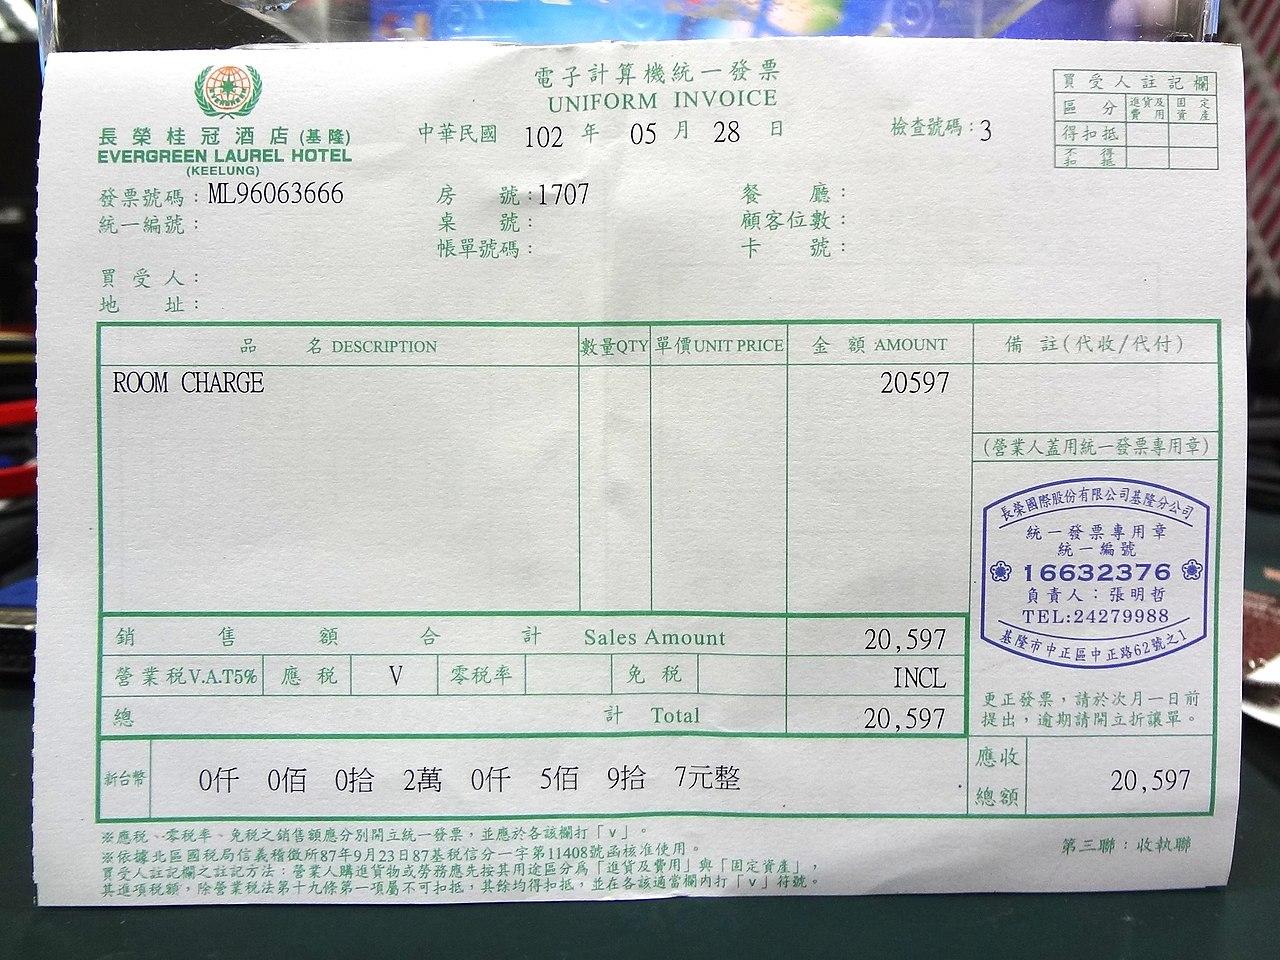 Hra Rent Receipt Format Fileeglhk Uniform Invoice  Pjpg  Wikimedia Commons Fake Invoice Generator Word with Charitable Tax Receipt Pdf Fileeglhk Uniform Invoice  Pjpg Electronic Invoice Payment Pdf